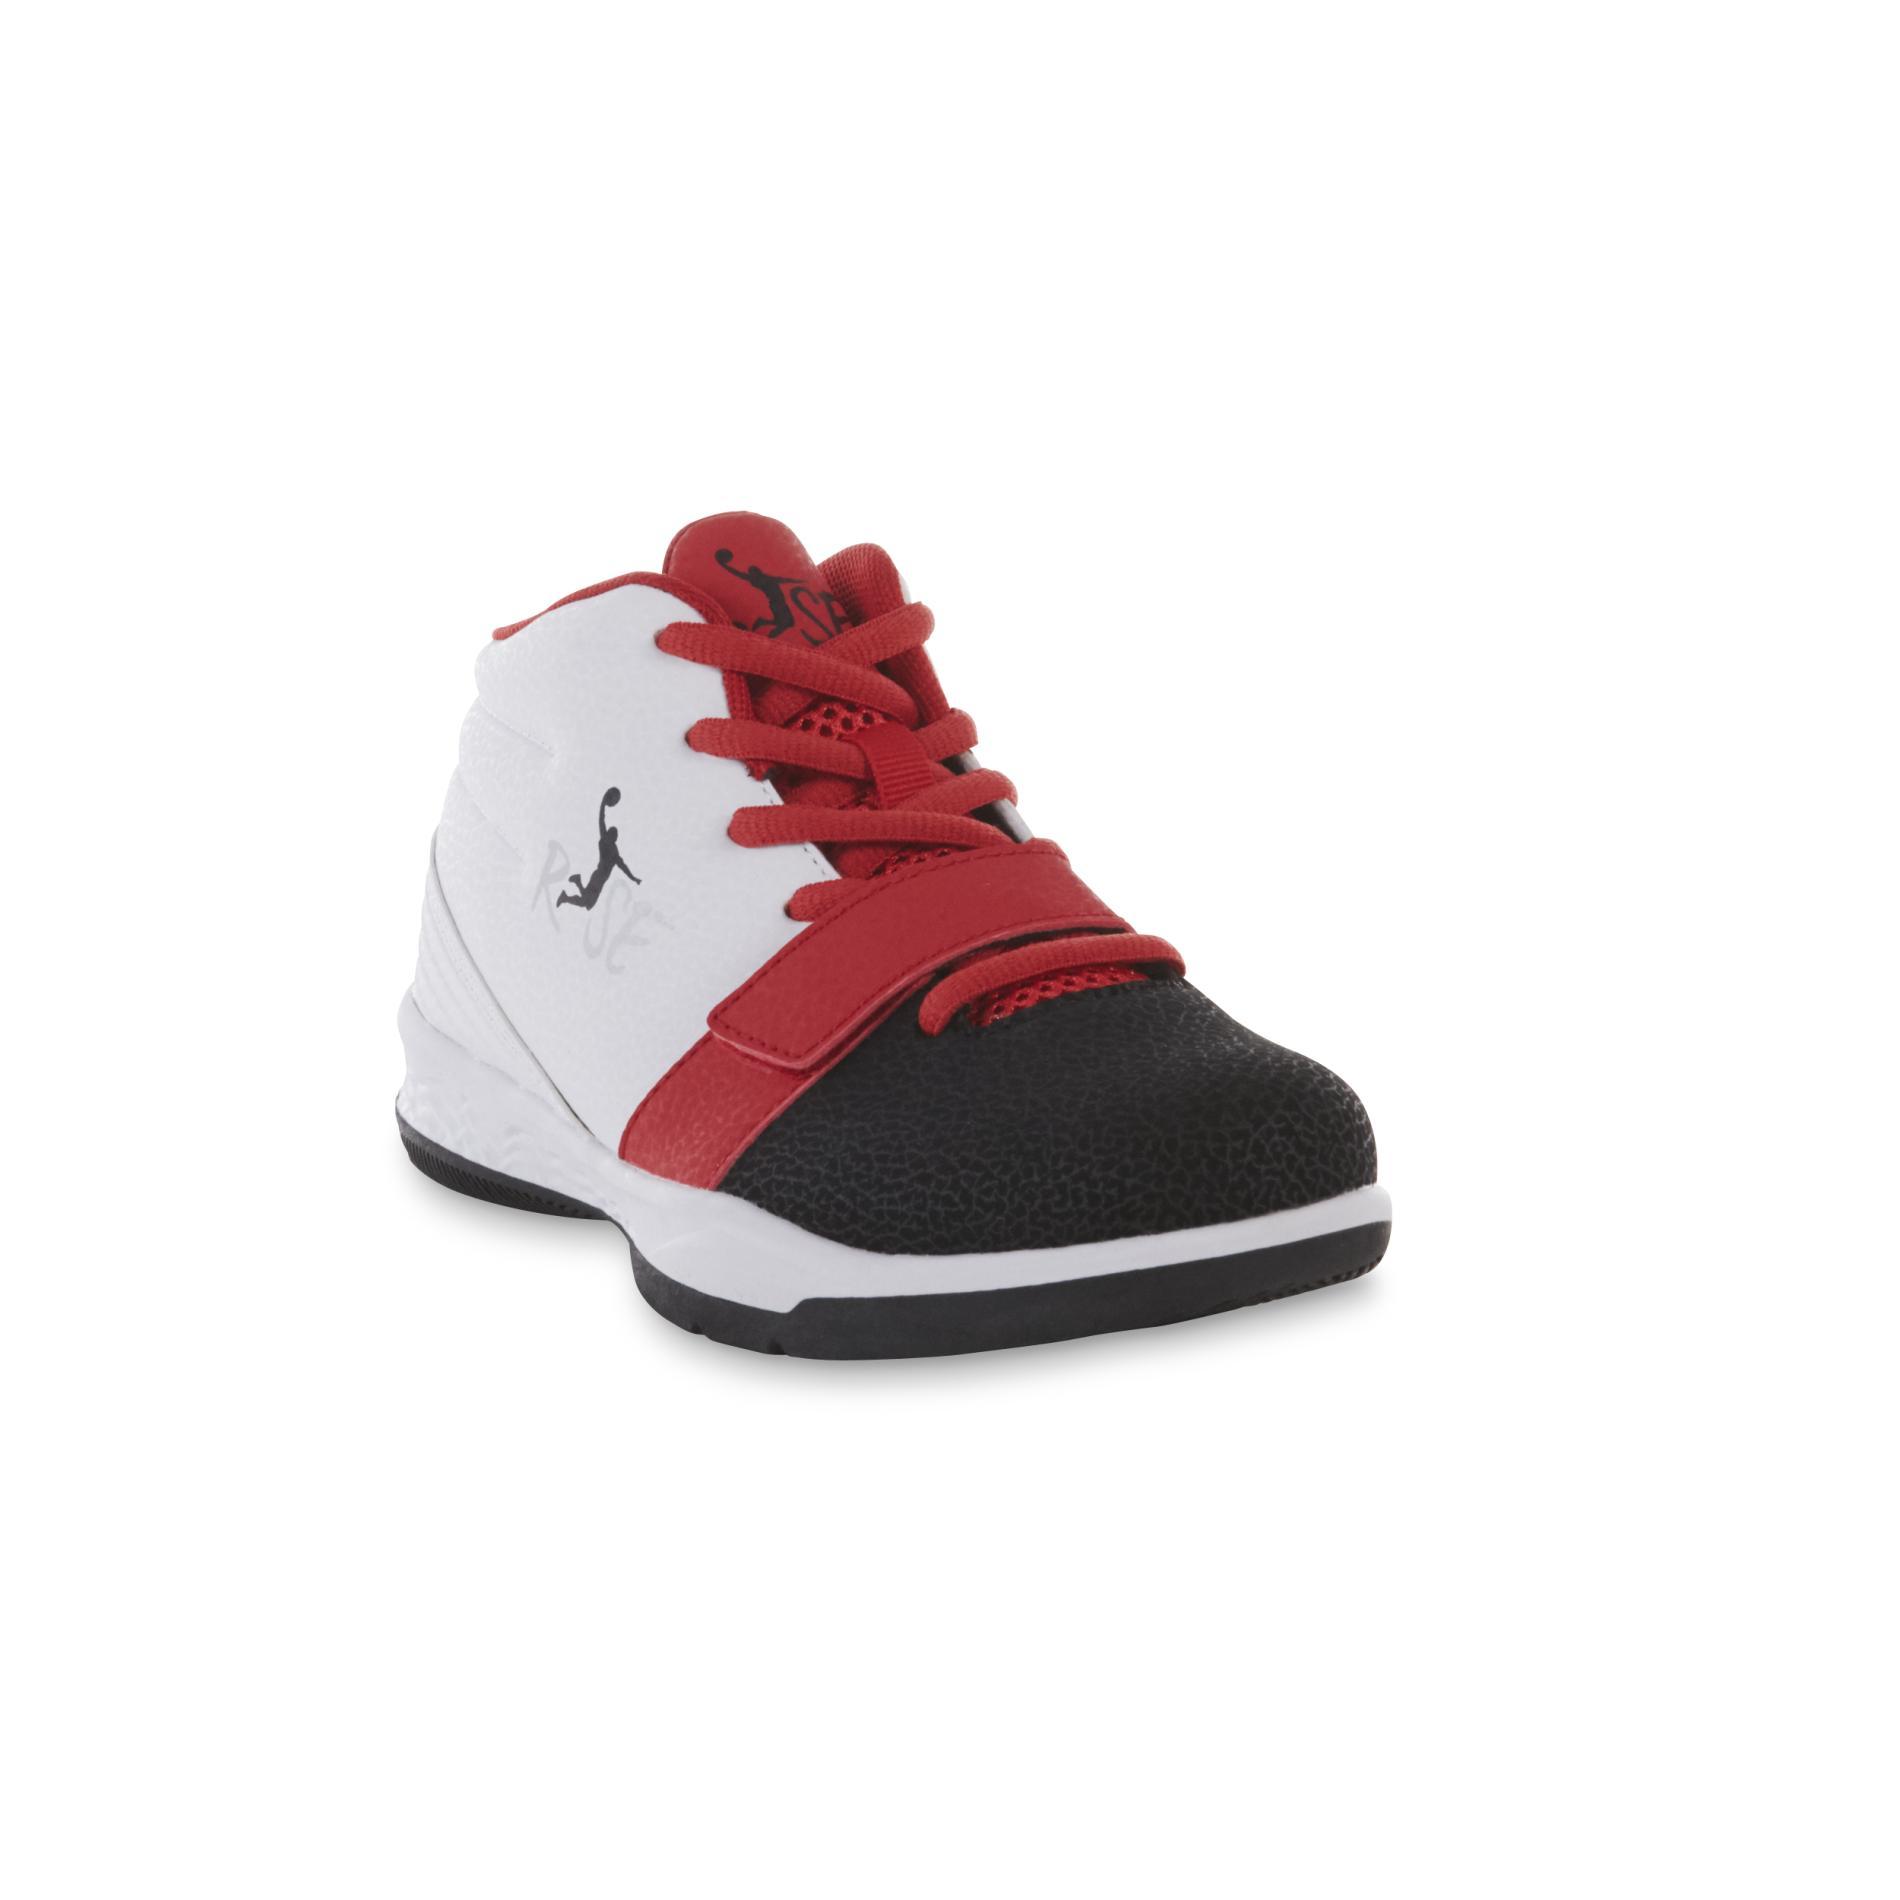 Risewear™ Boy's Loop Red/Black/White Shoe